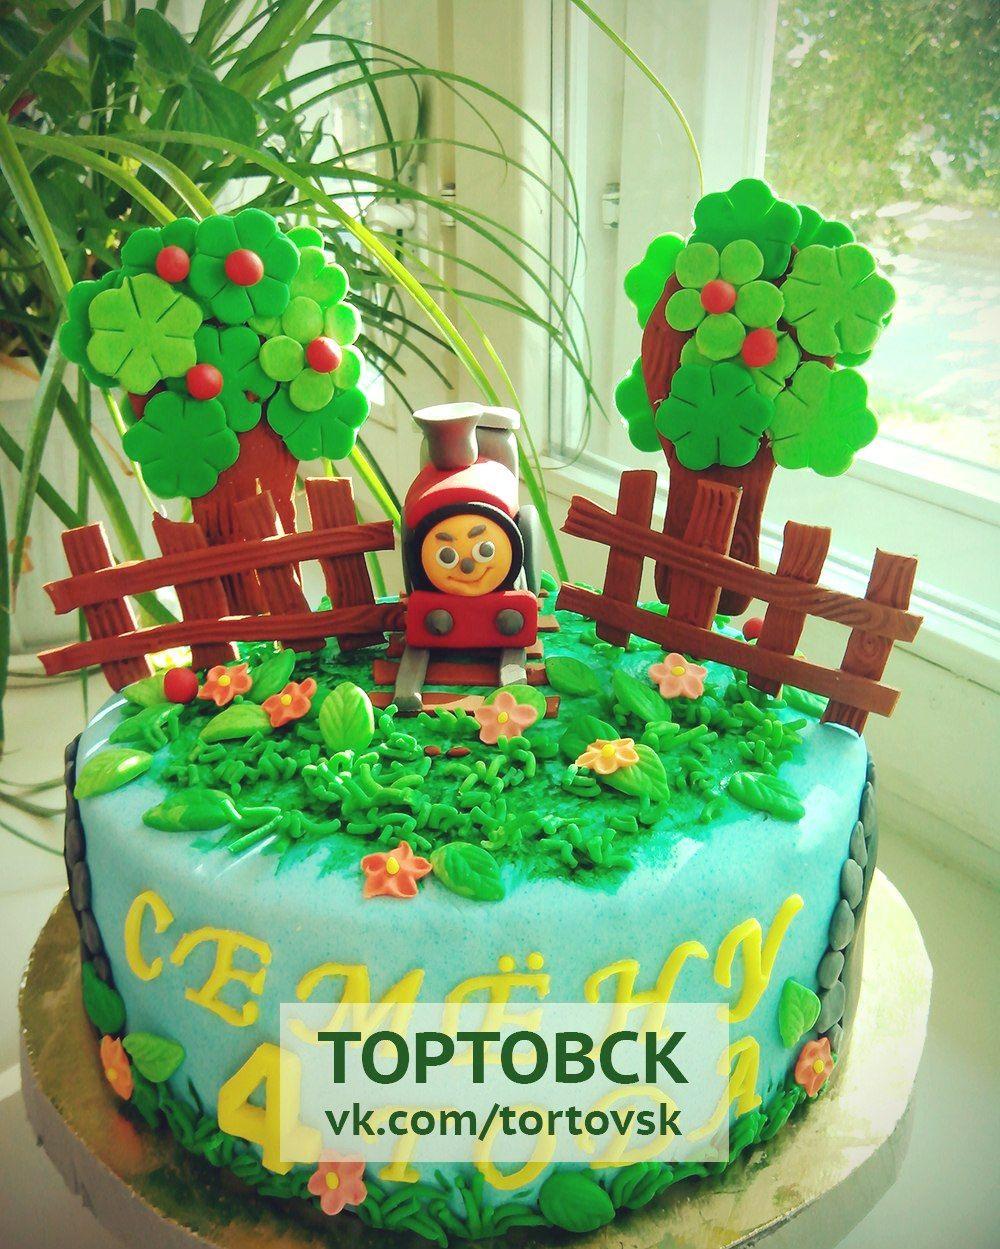 Boy Pies To Order Ulyanovsk Cakes To Order Cakes To Order